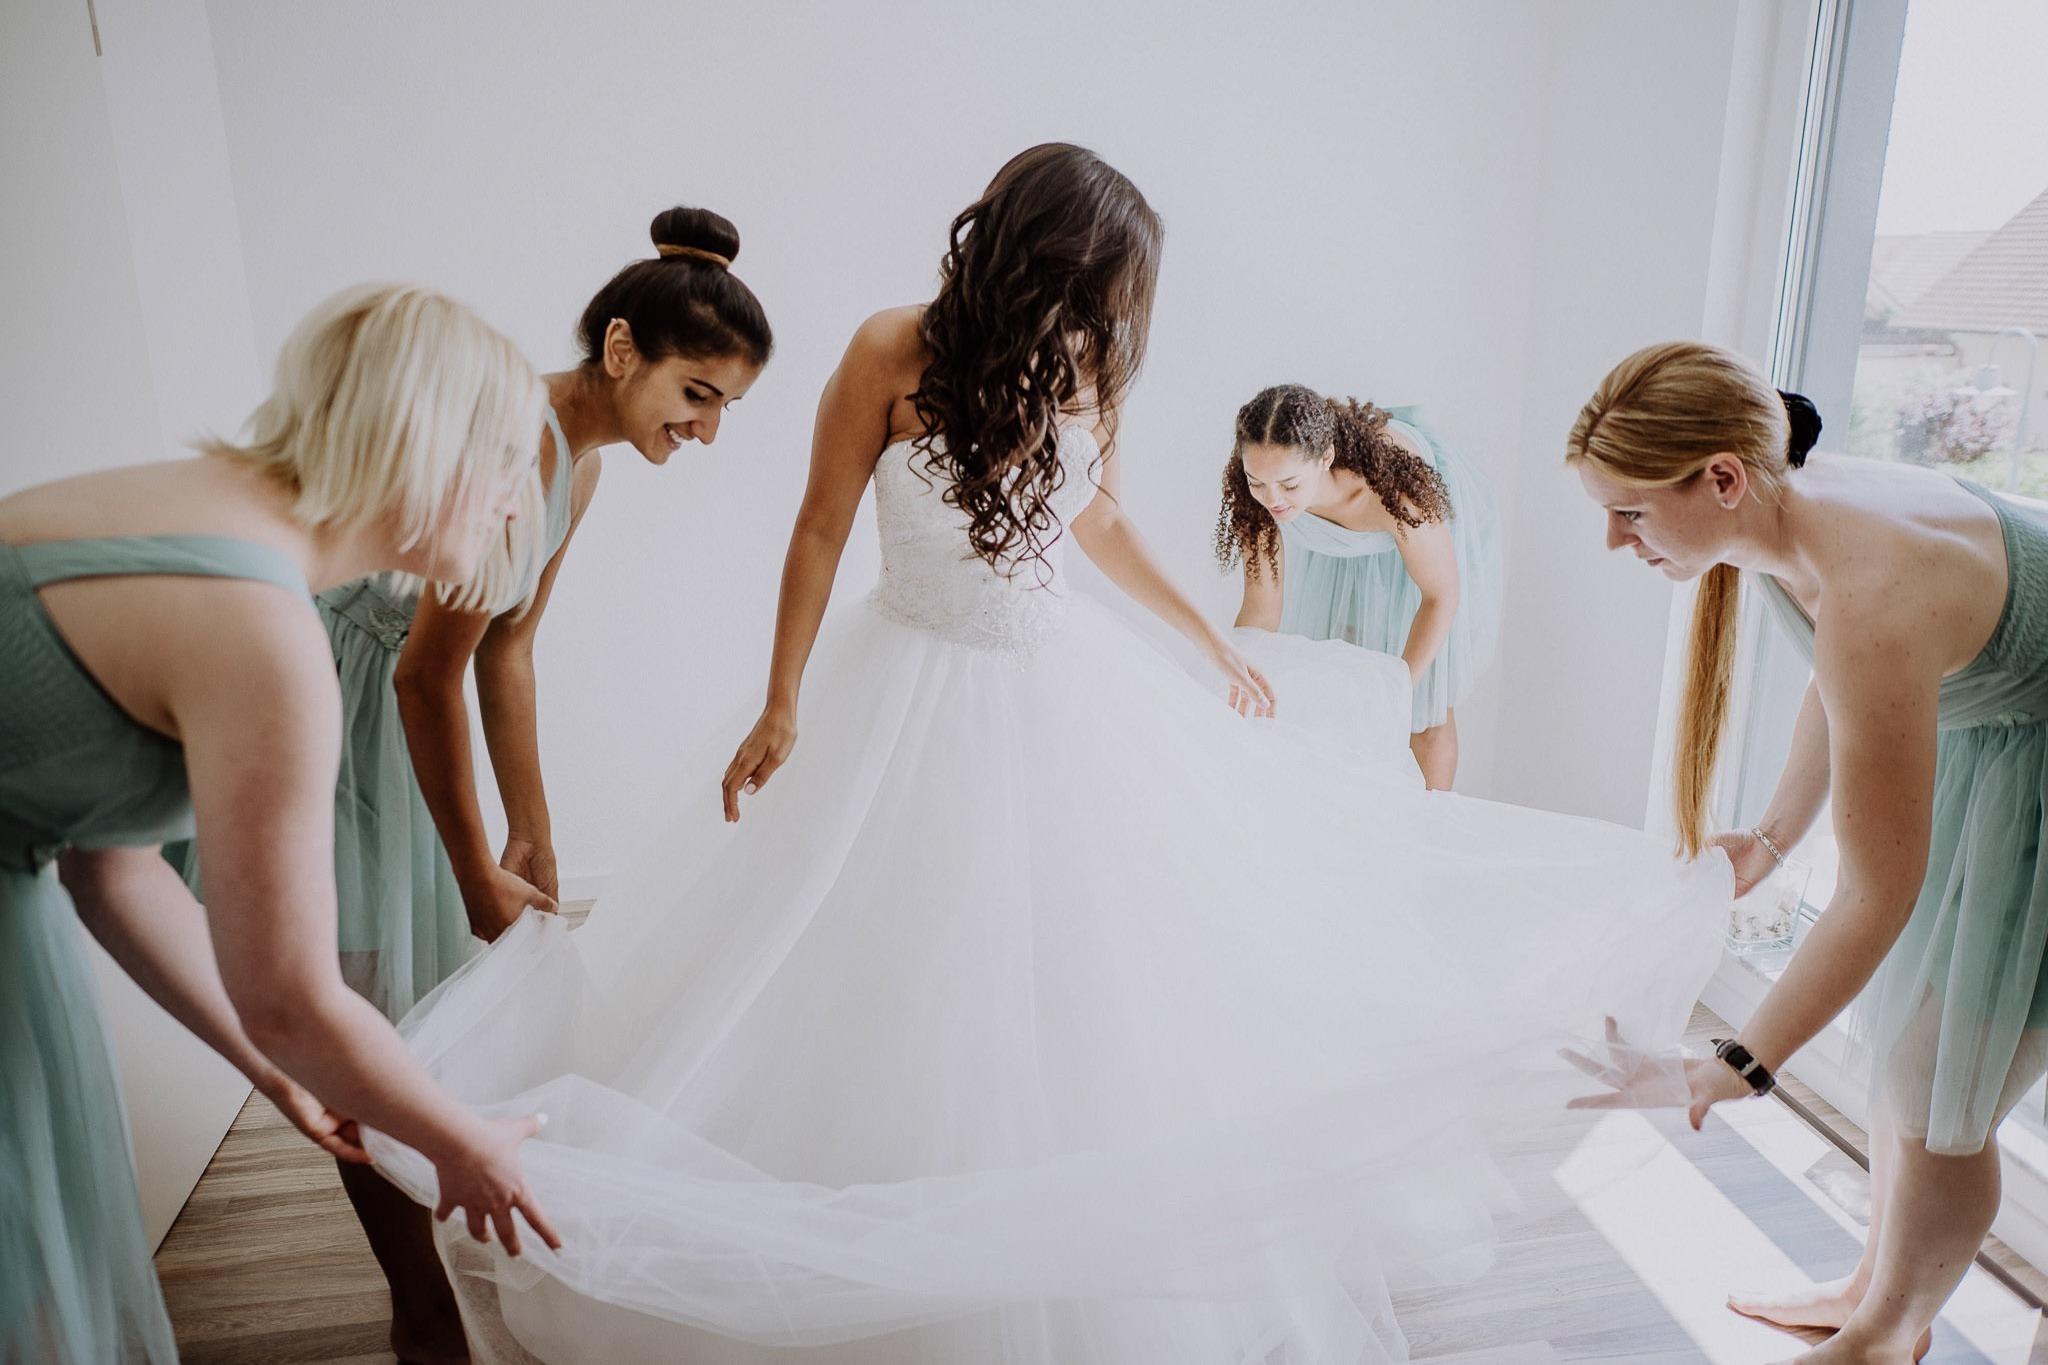 wedding photographer hamilton new zealand 1003 3